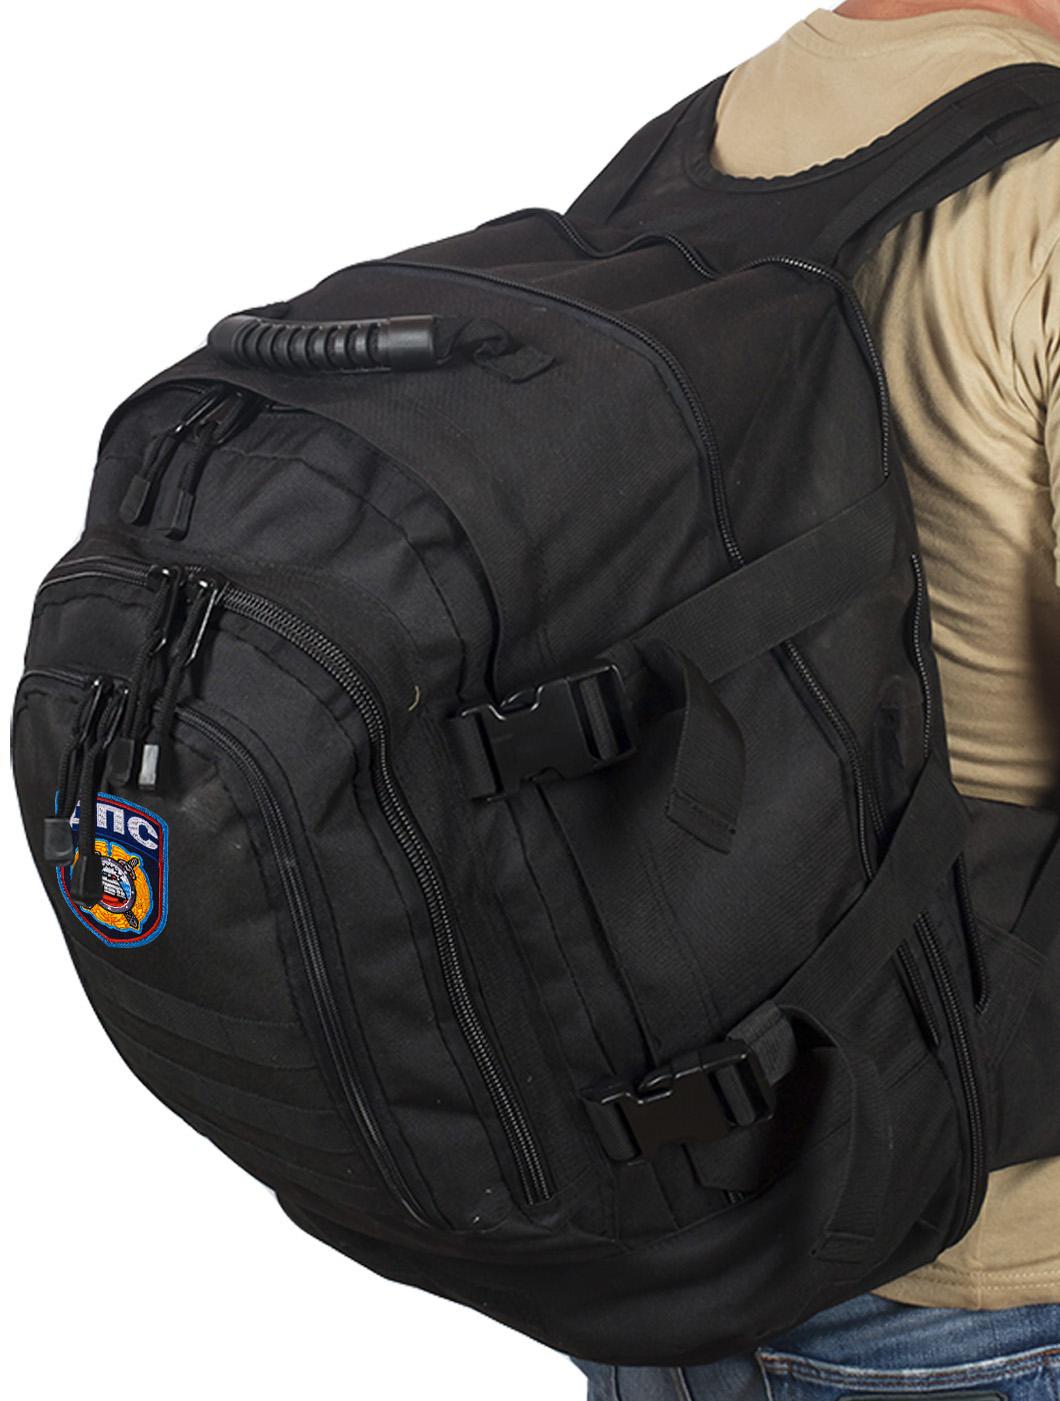 Тактический армейский рюкзак с нашивкой ДПС